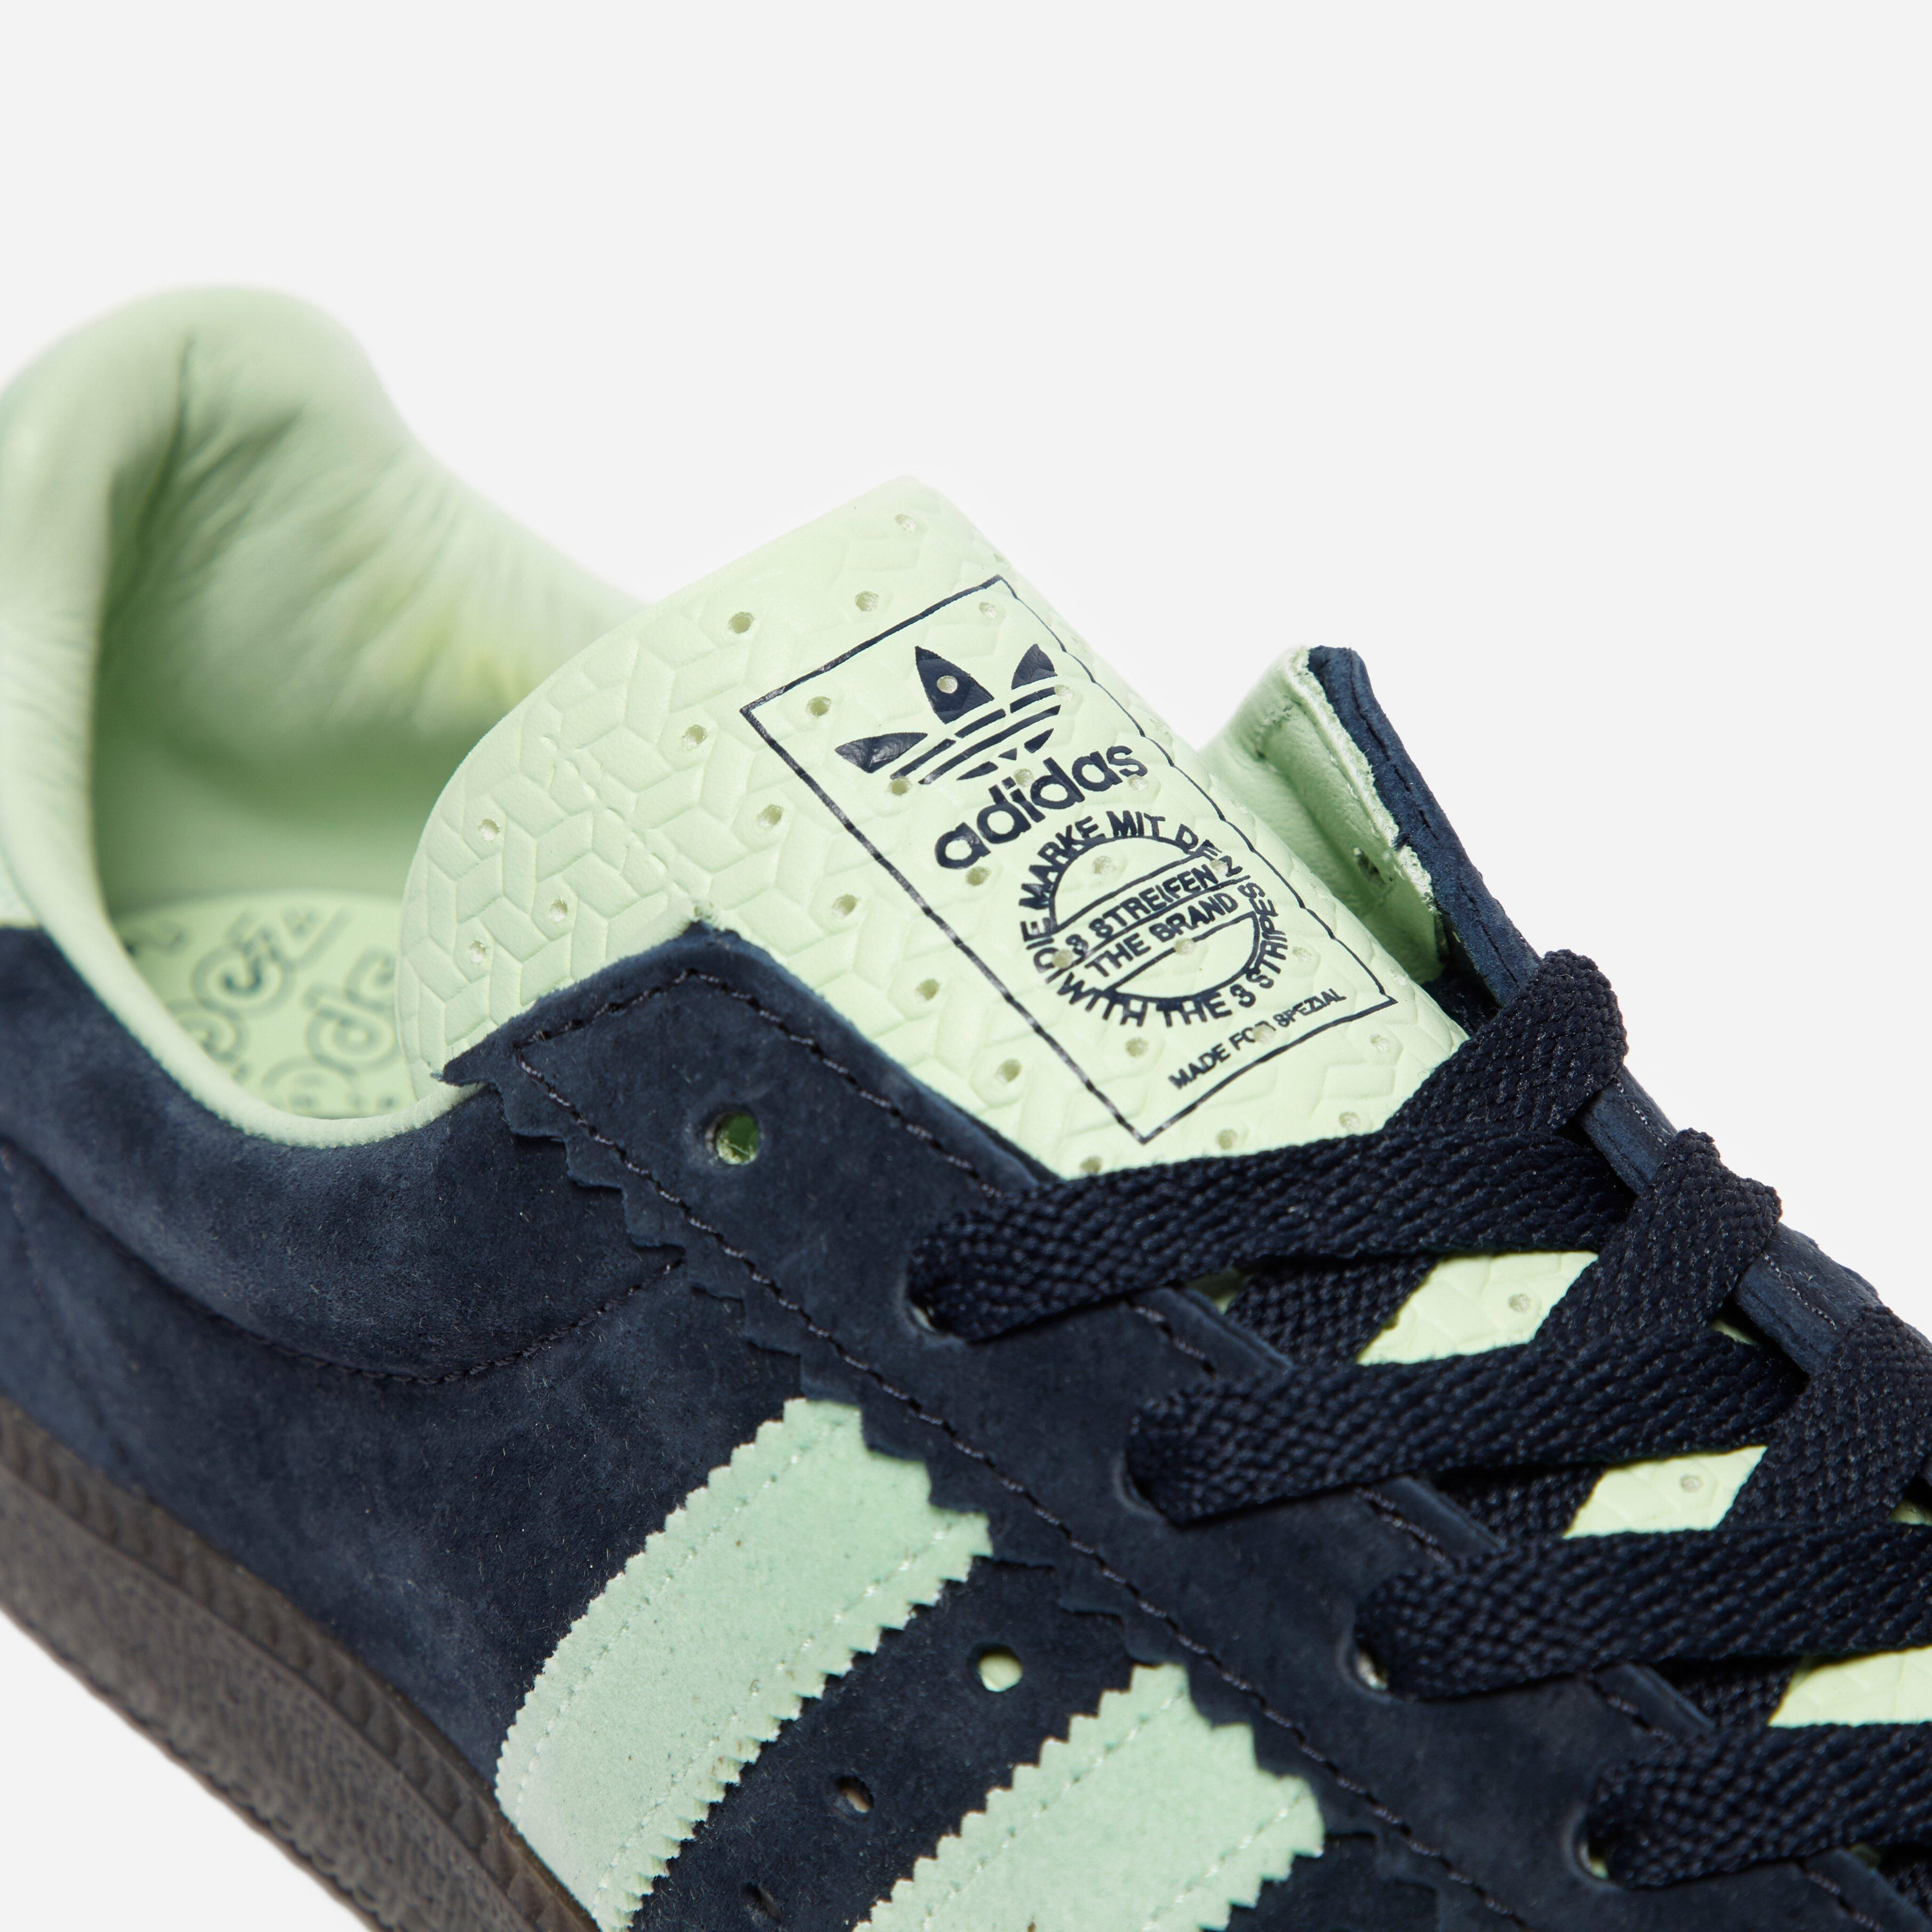 Adidas Originals Adidas Originals Padiham Spzl in Blue for Men - Lyst 0bbdbd745